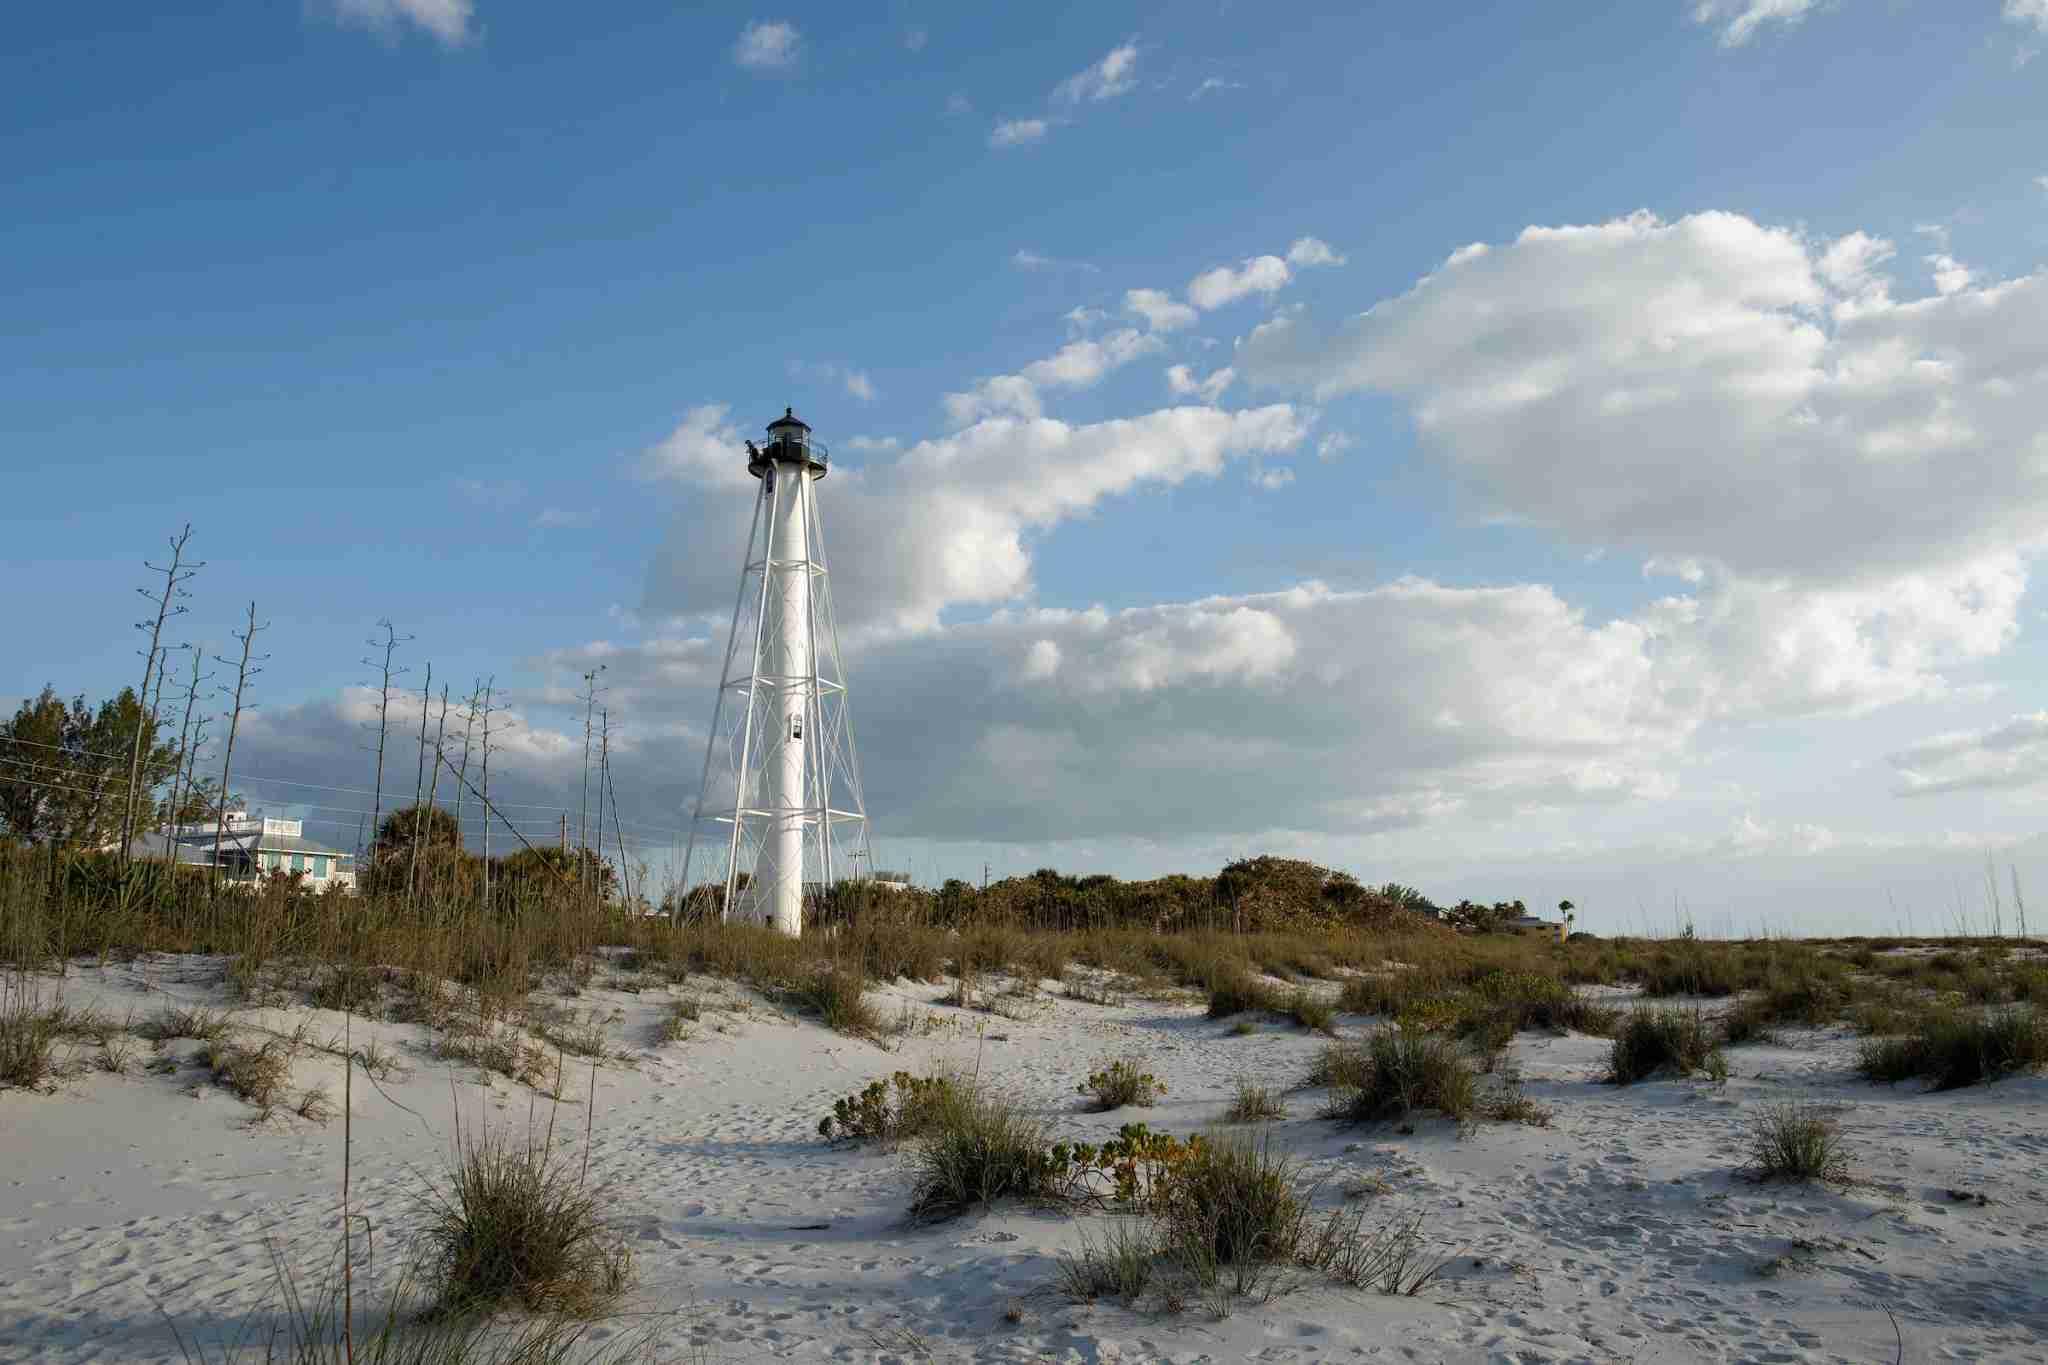 Gasparilla Island - Boca Grande, Florida